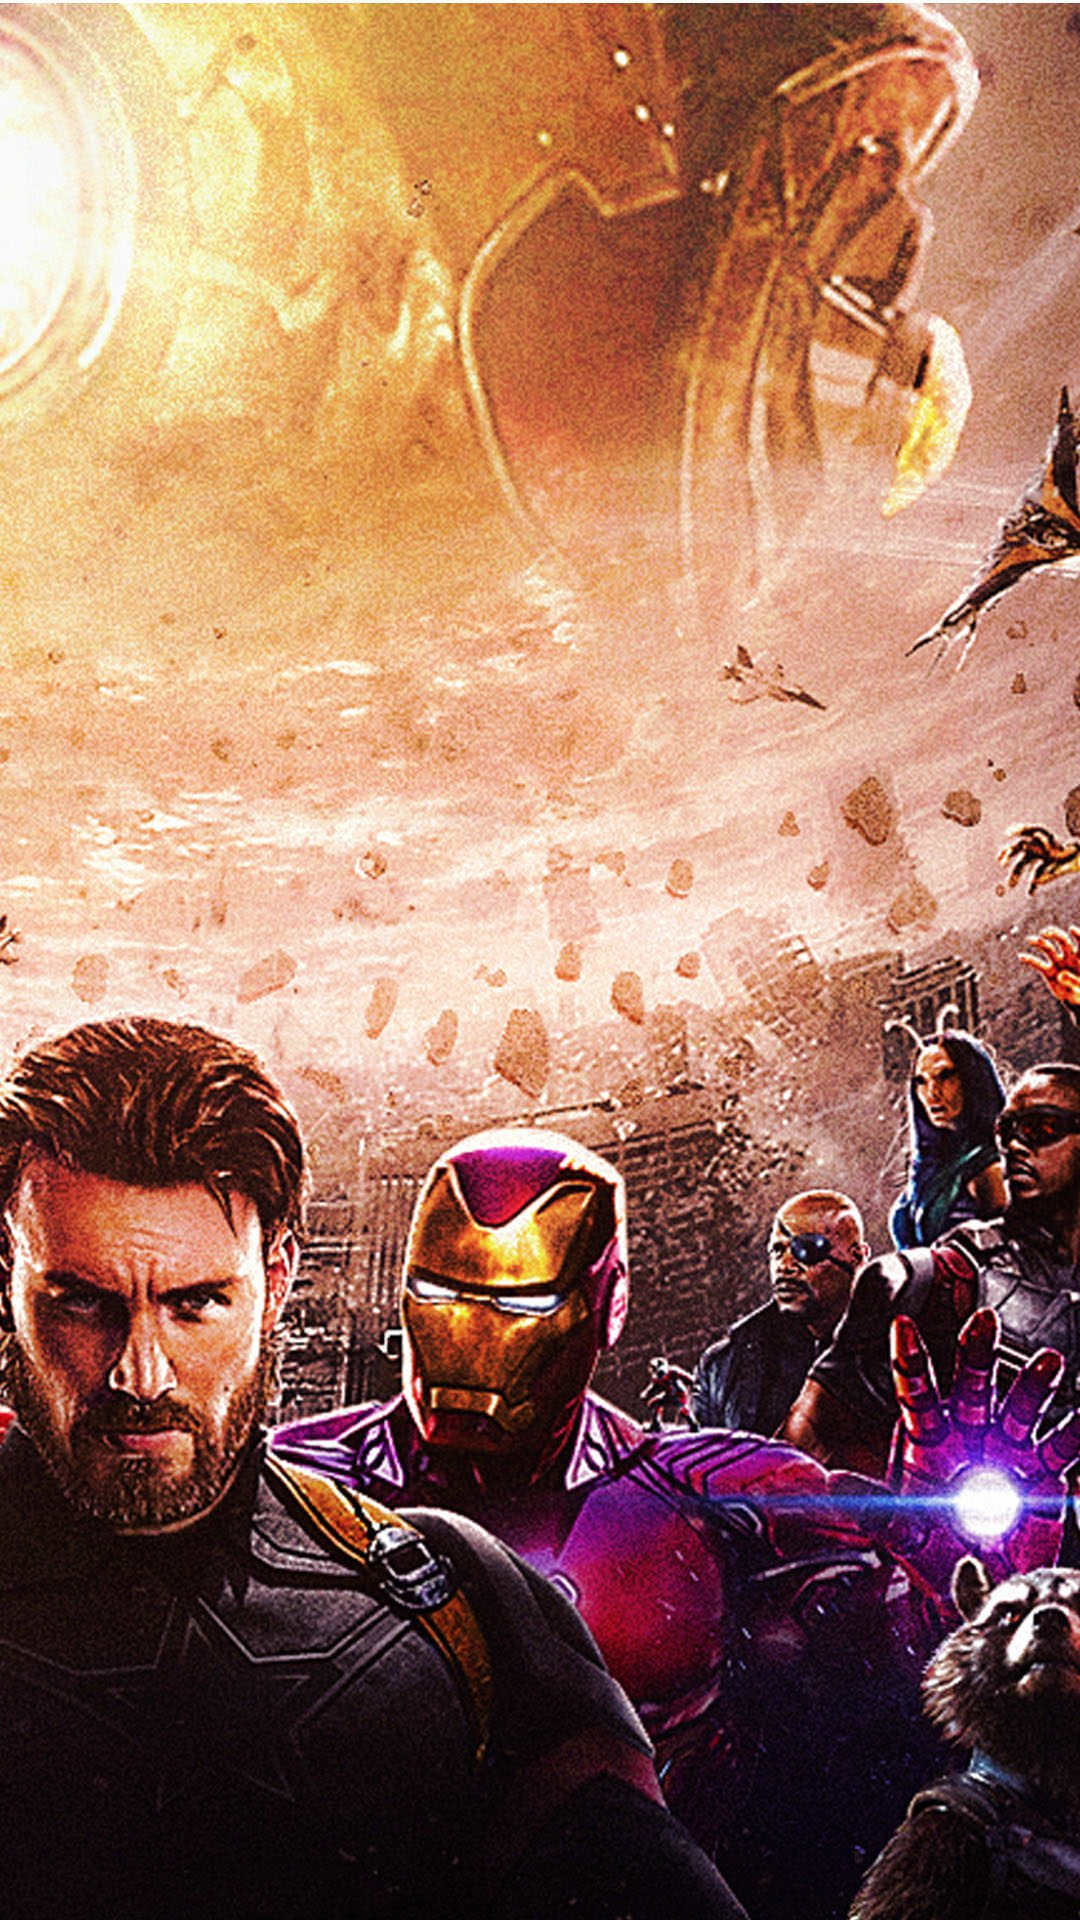 25+ Best Avengers iPhone Wallpapers 2018 - Templatefor